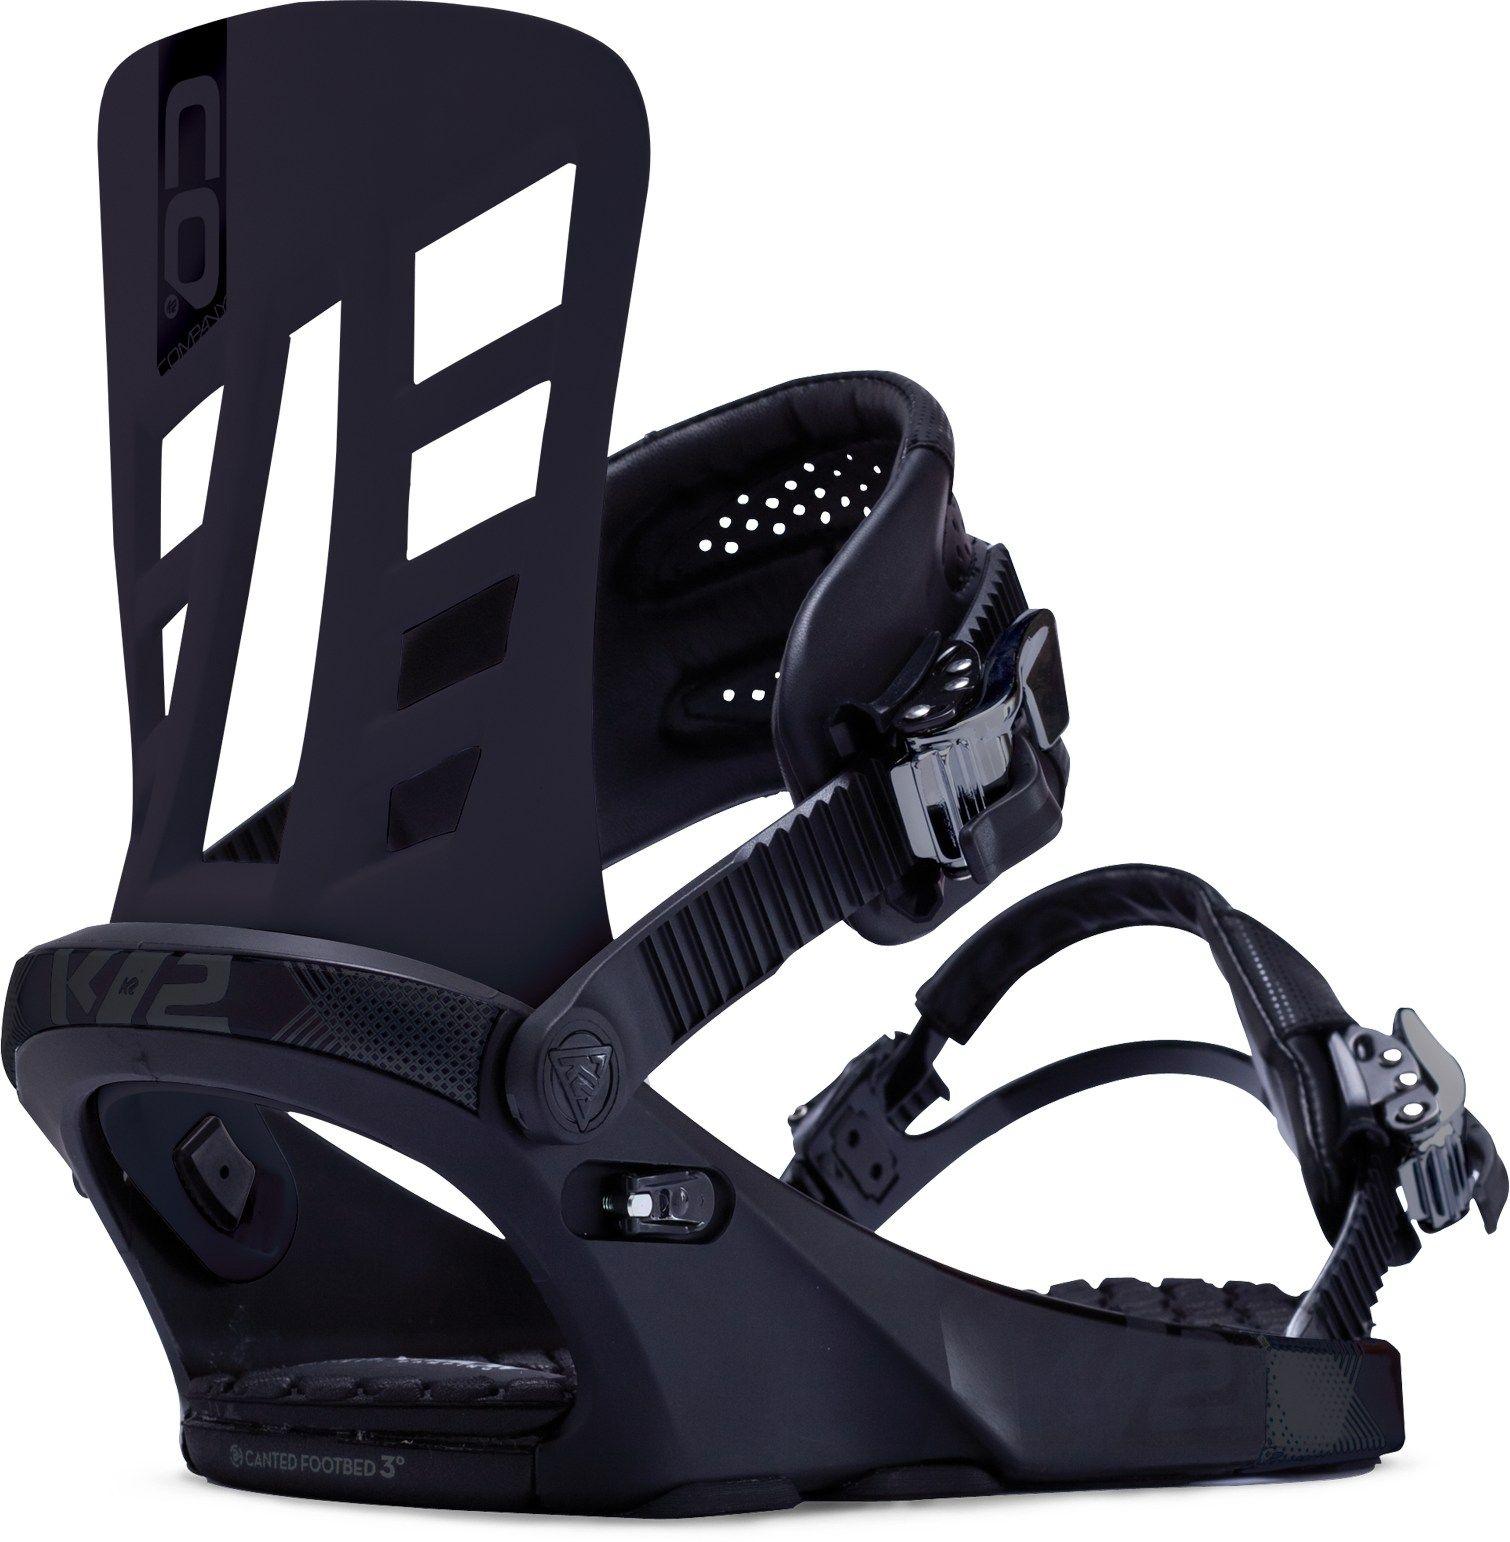 K2 Male Company Snowboard Bindings / Snowboard bindings